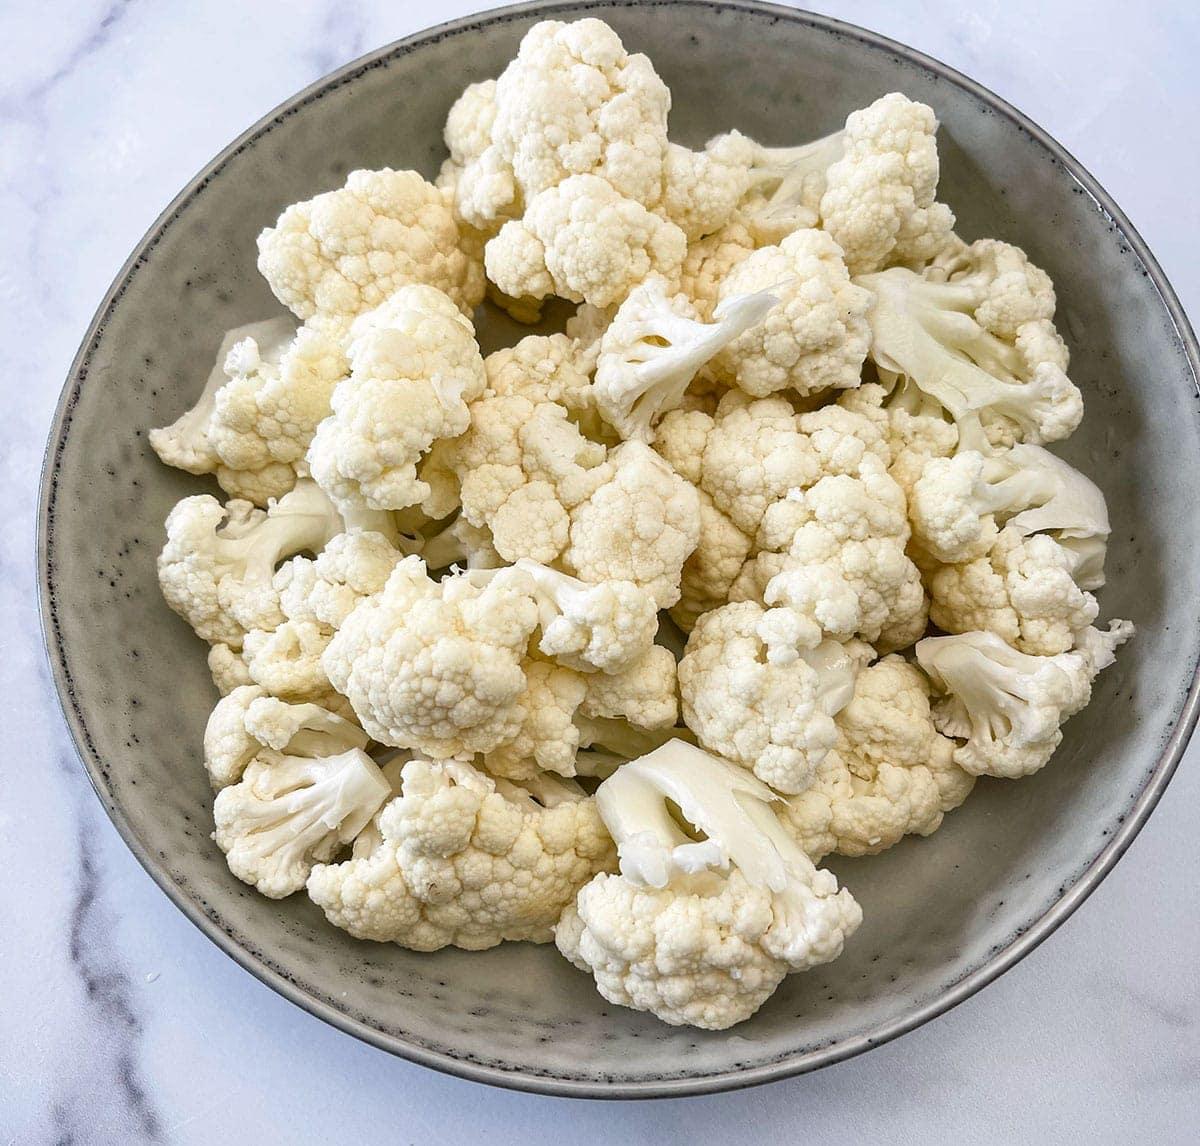 cut cauliflower florets in a beige bowl on a white background